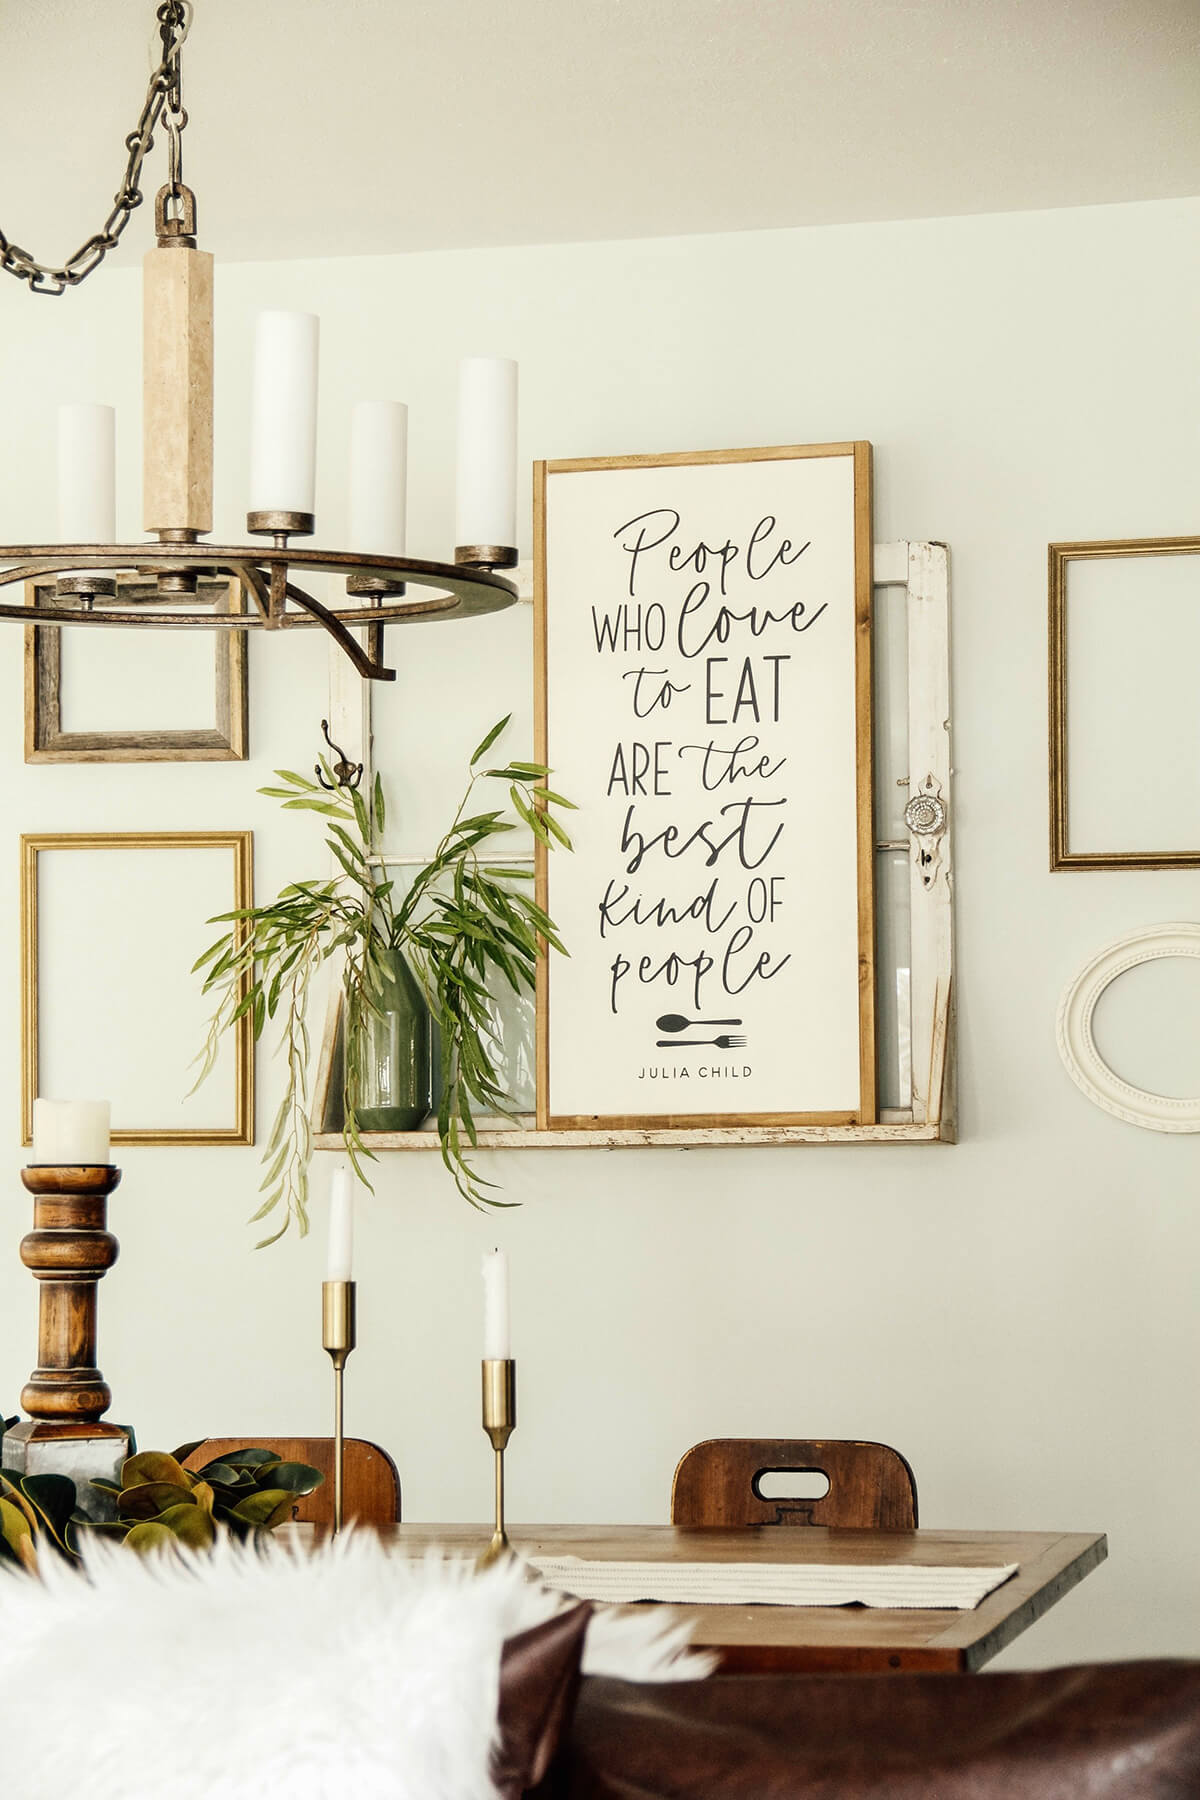 Julia Child Quote for the Kitchen